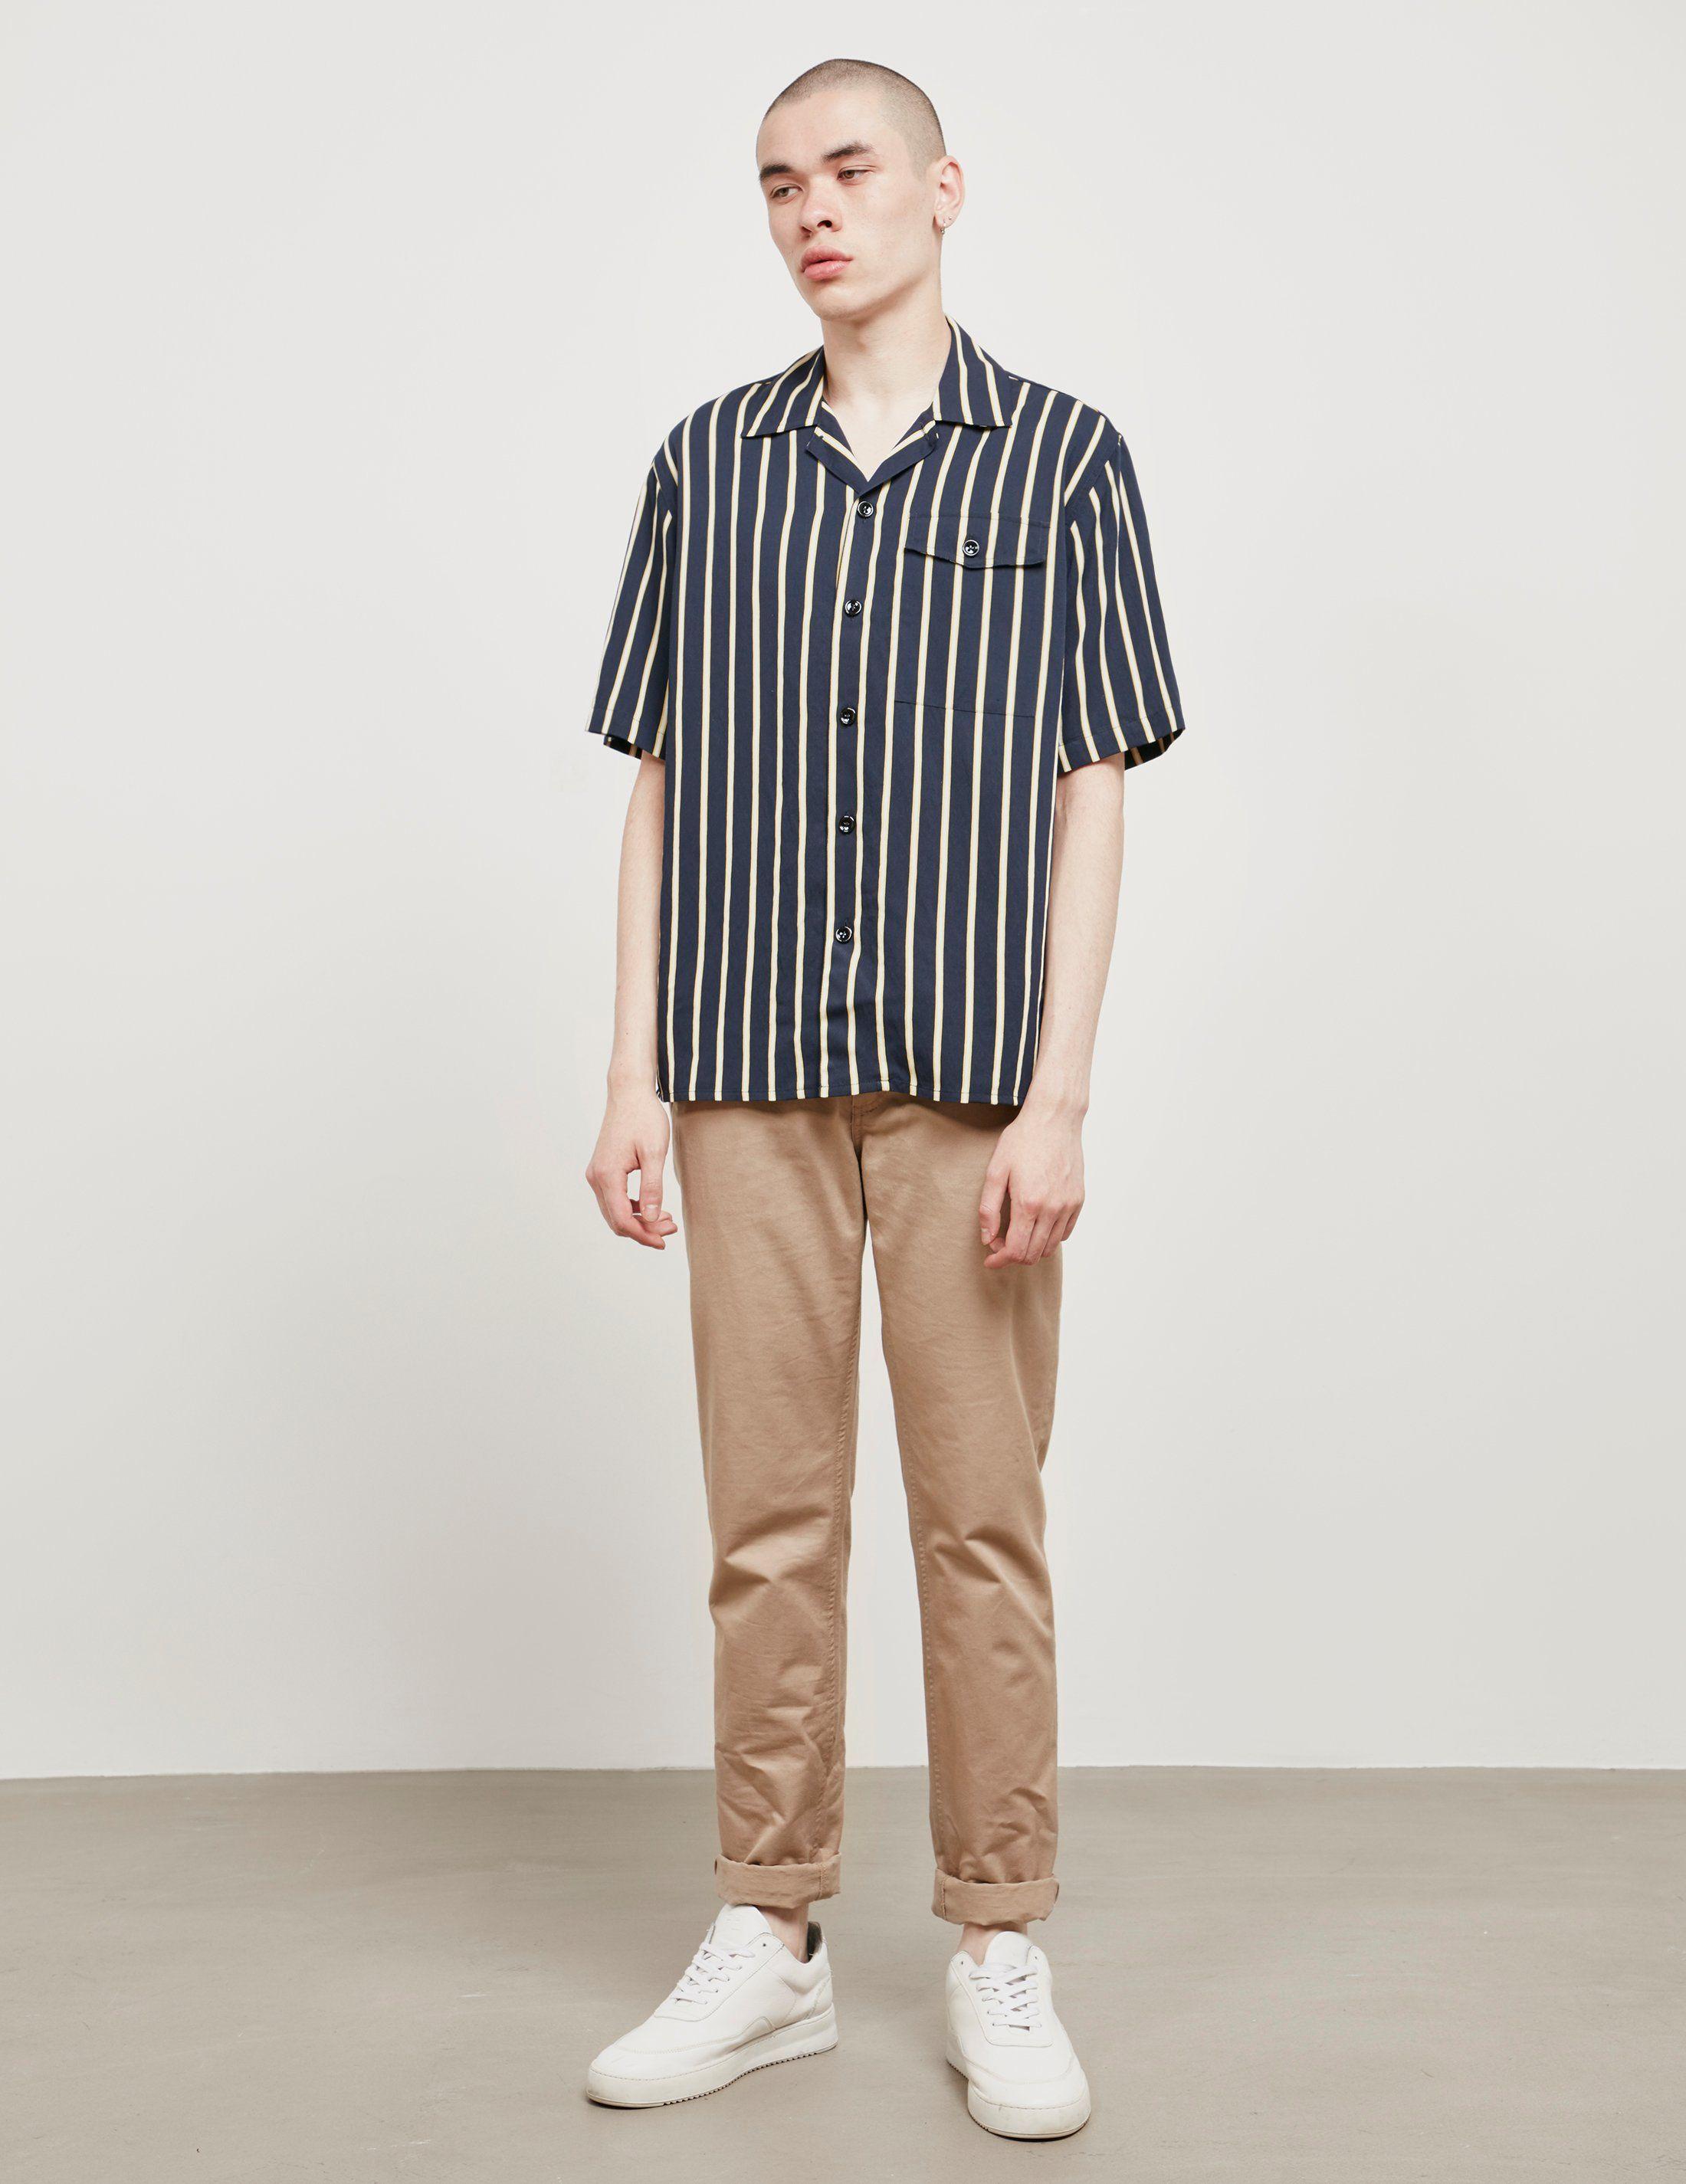 AMI Paris Stripe Short Sleeve Shirt - Online Exclusive